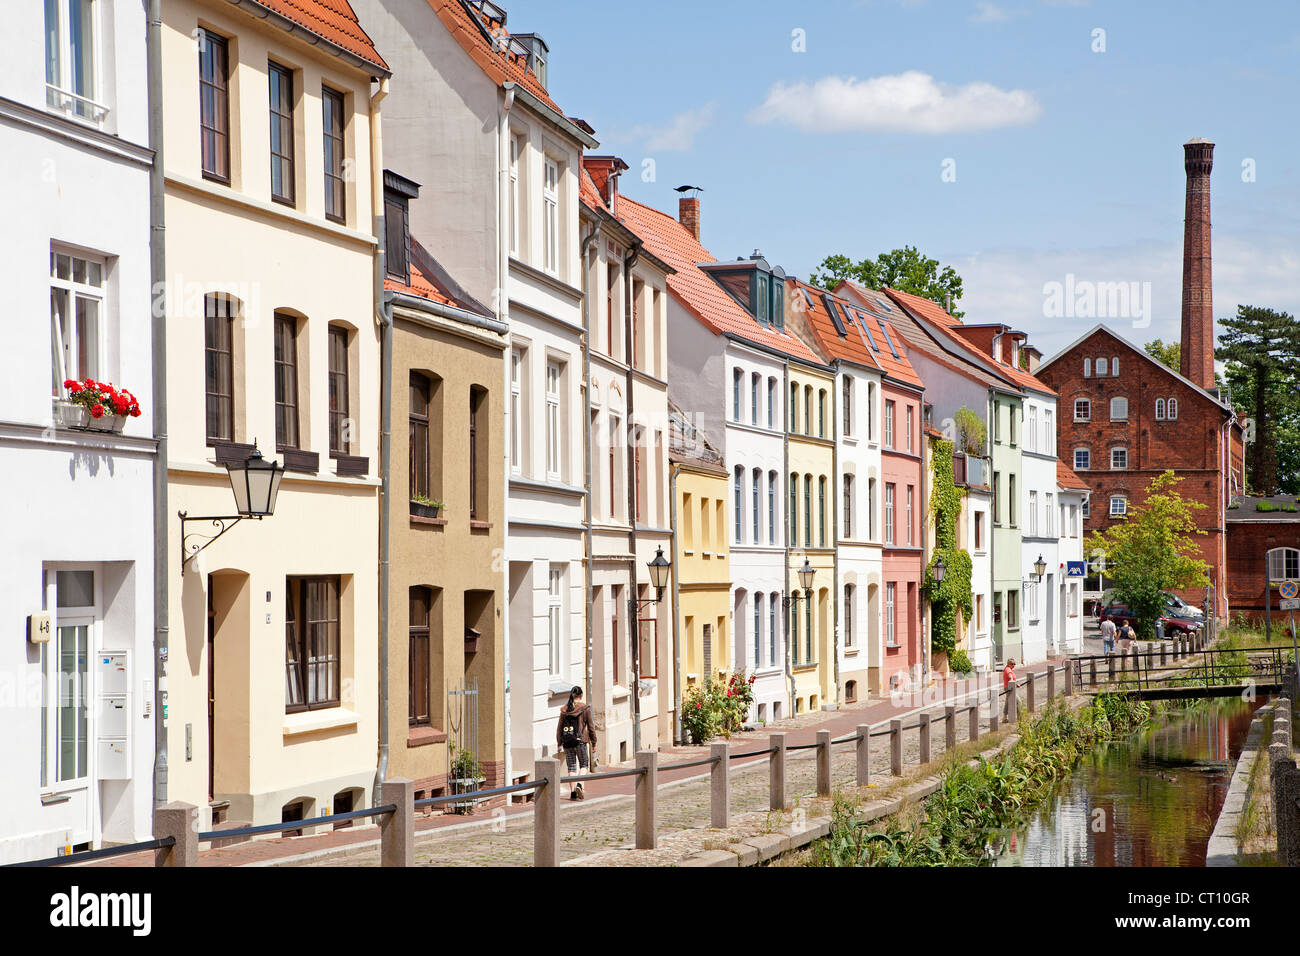 street Muehlengrube, Wismar, Mecklenburg-West Pomerania, Germany Stock Photo